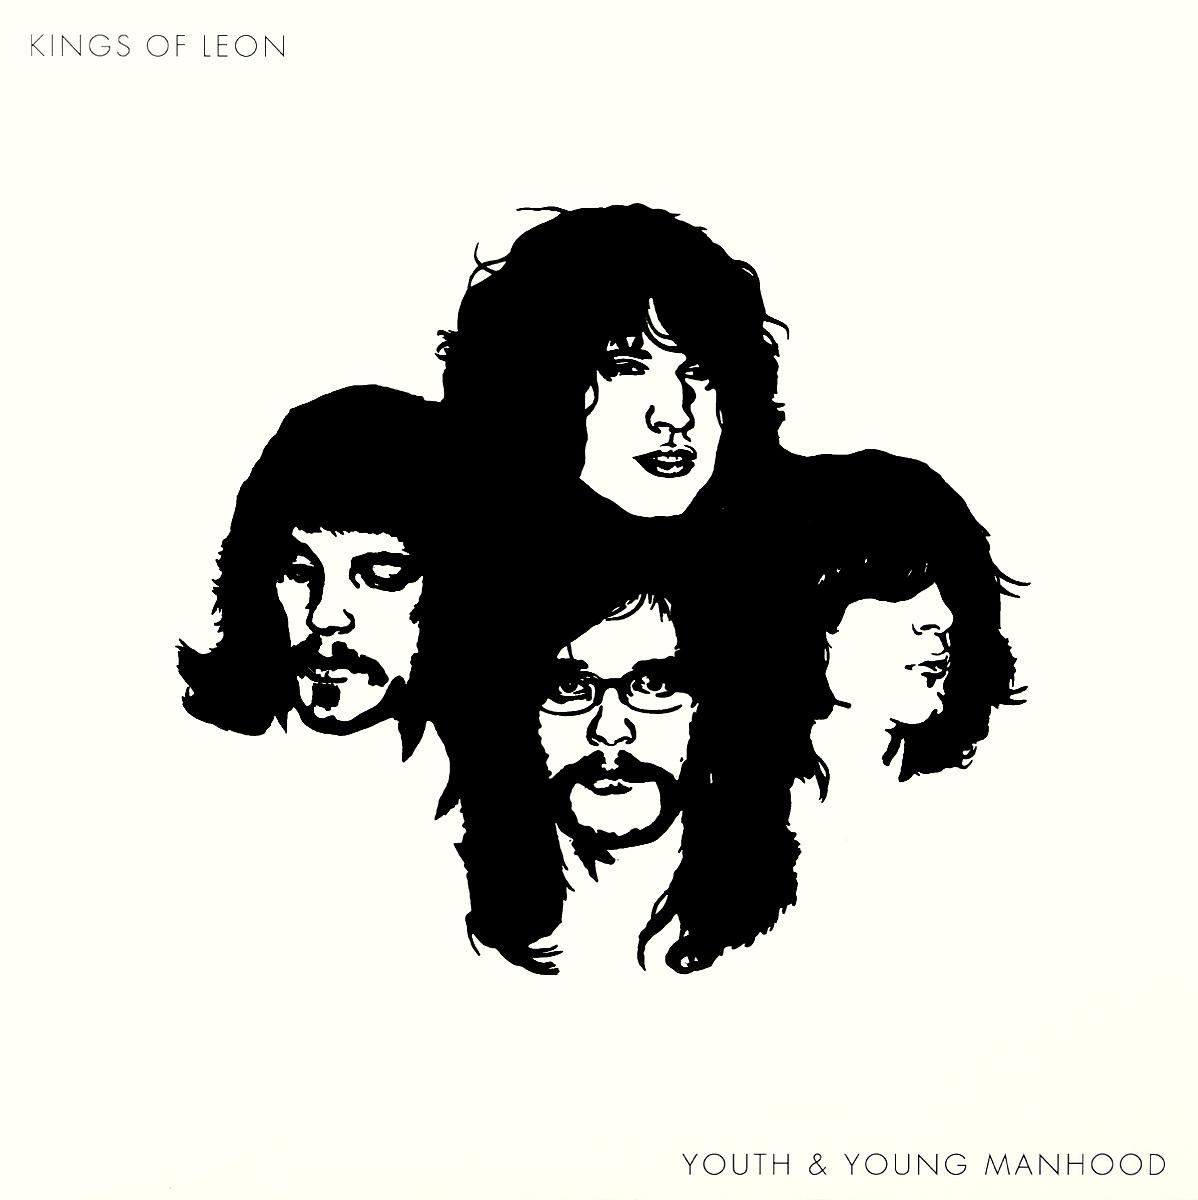 Kings Of Leon Kings Of Leon. Youth And Young Manhood (2 LP) leon bridges leon bridges good thing lp